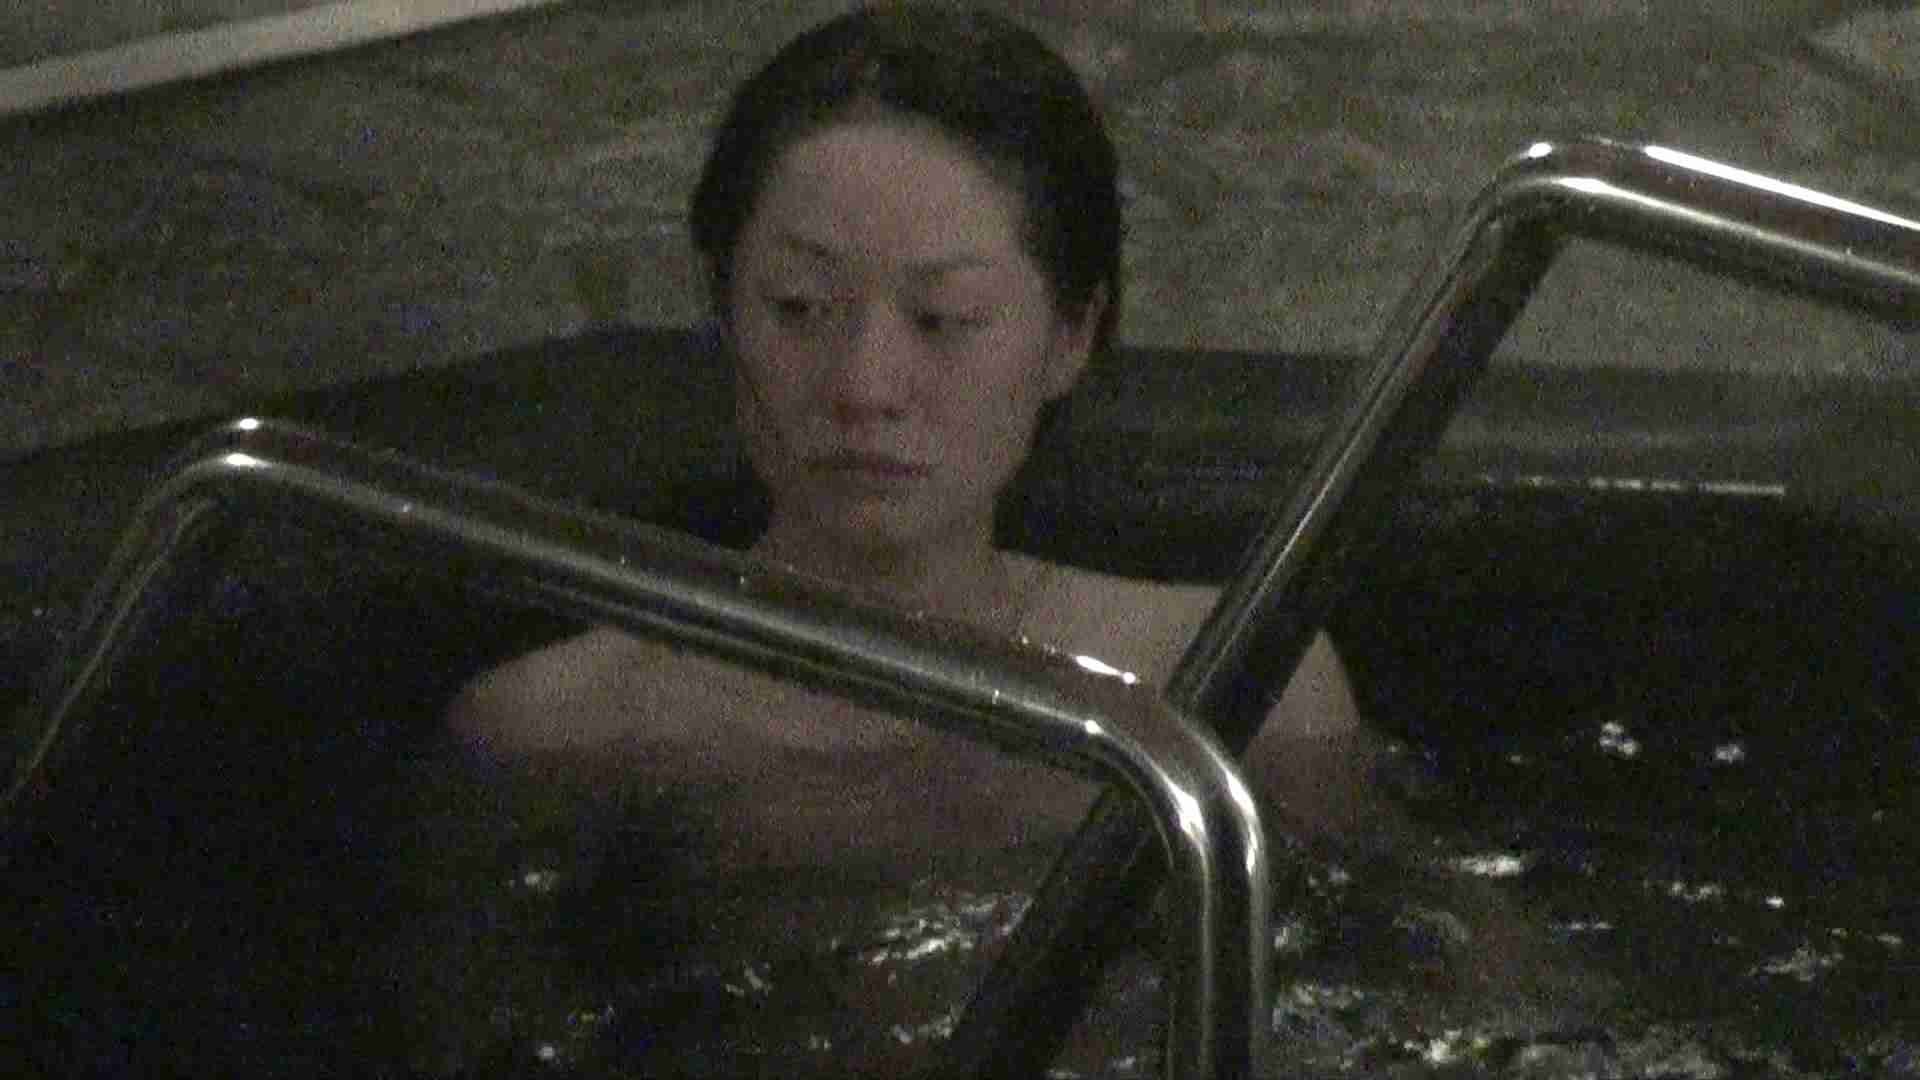 Aquaな露天風呂Vol.318 露天風呂編  109PIX 102